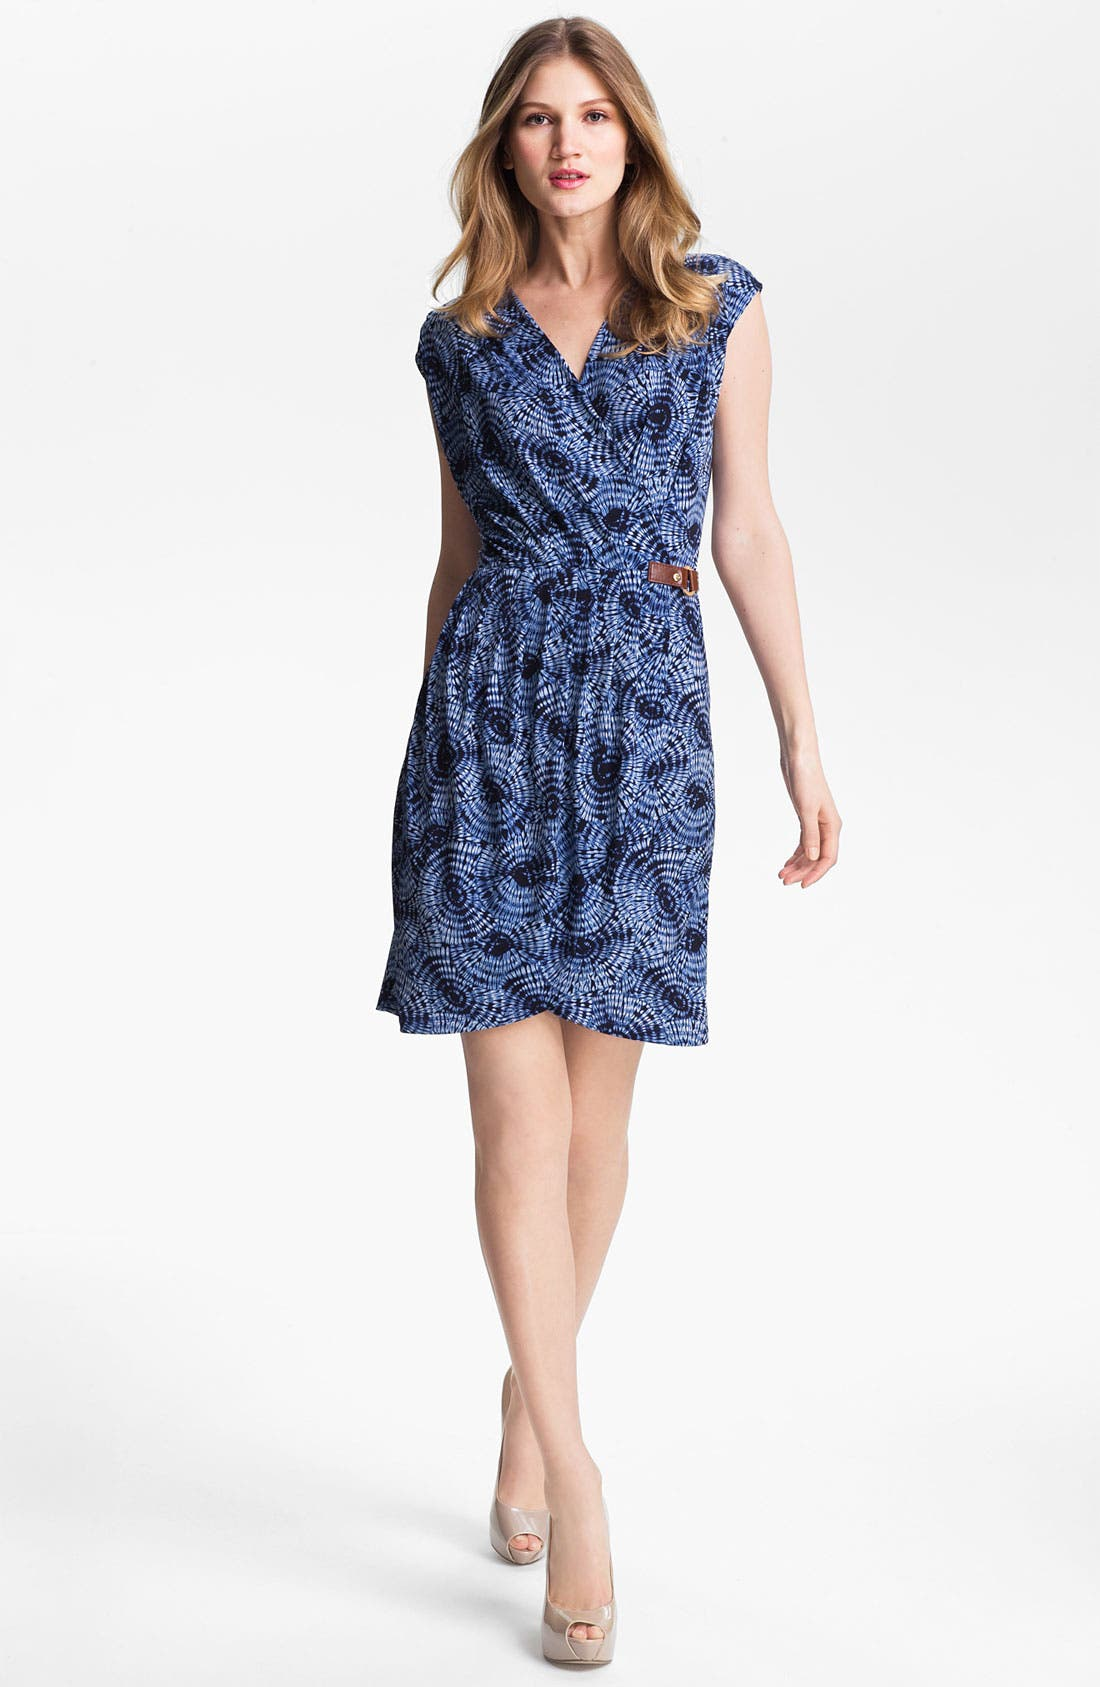 Alternate Image 1 Selected - MICHAEL Michael Kors Parasol Print Faux Wrap Dress